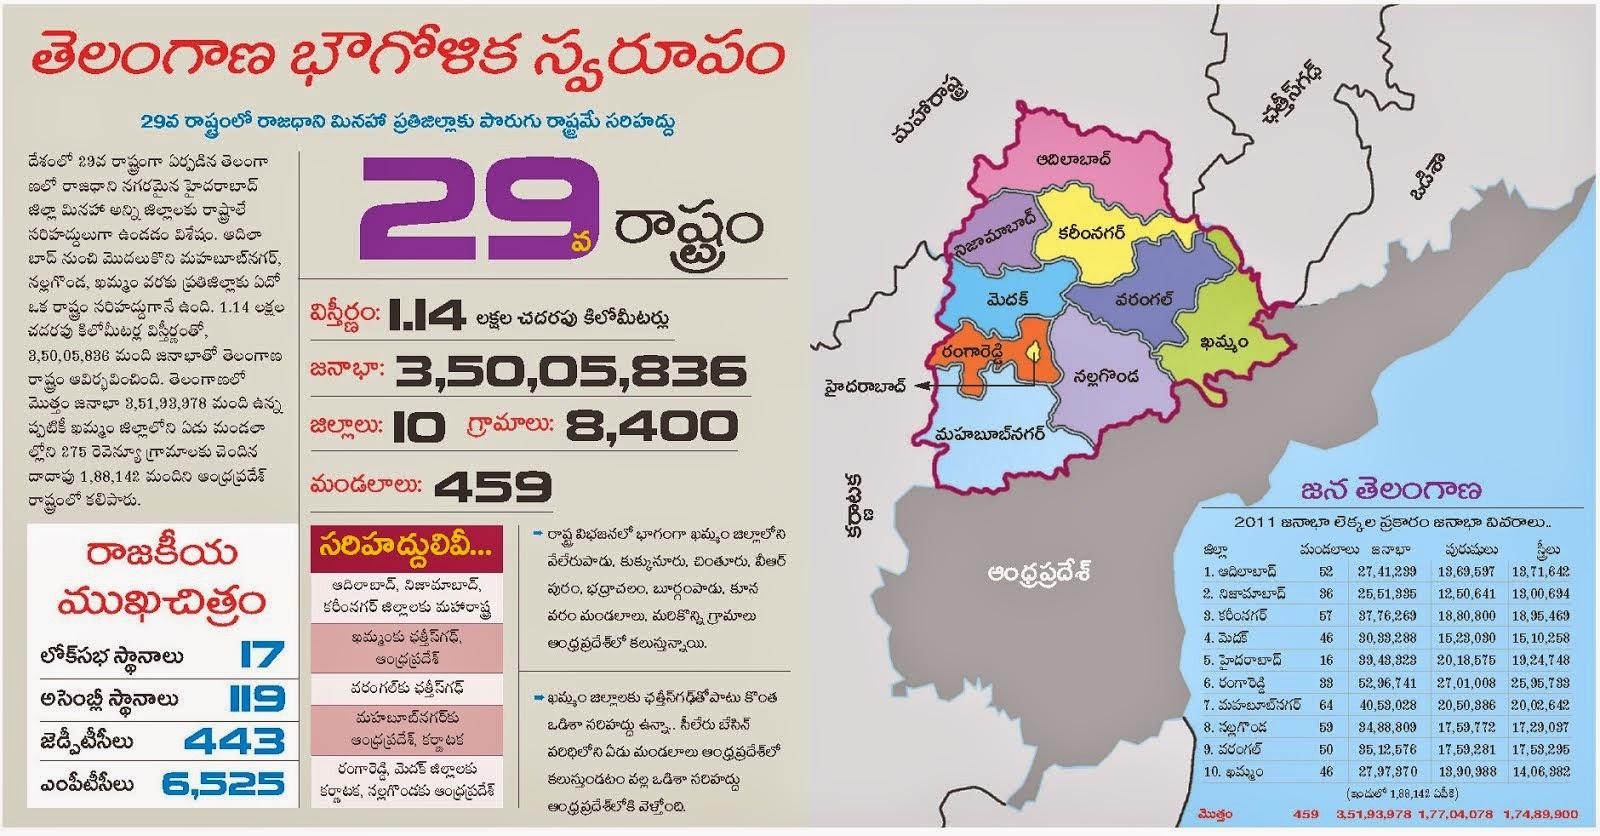 Telangana State Profile